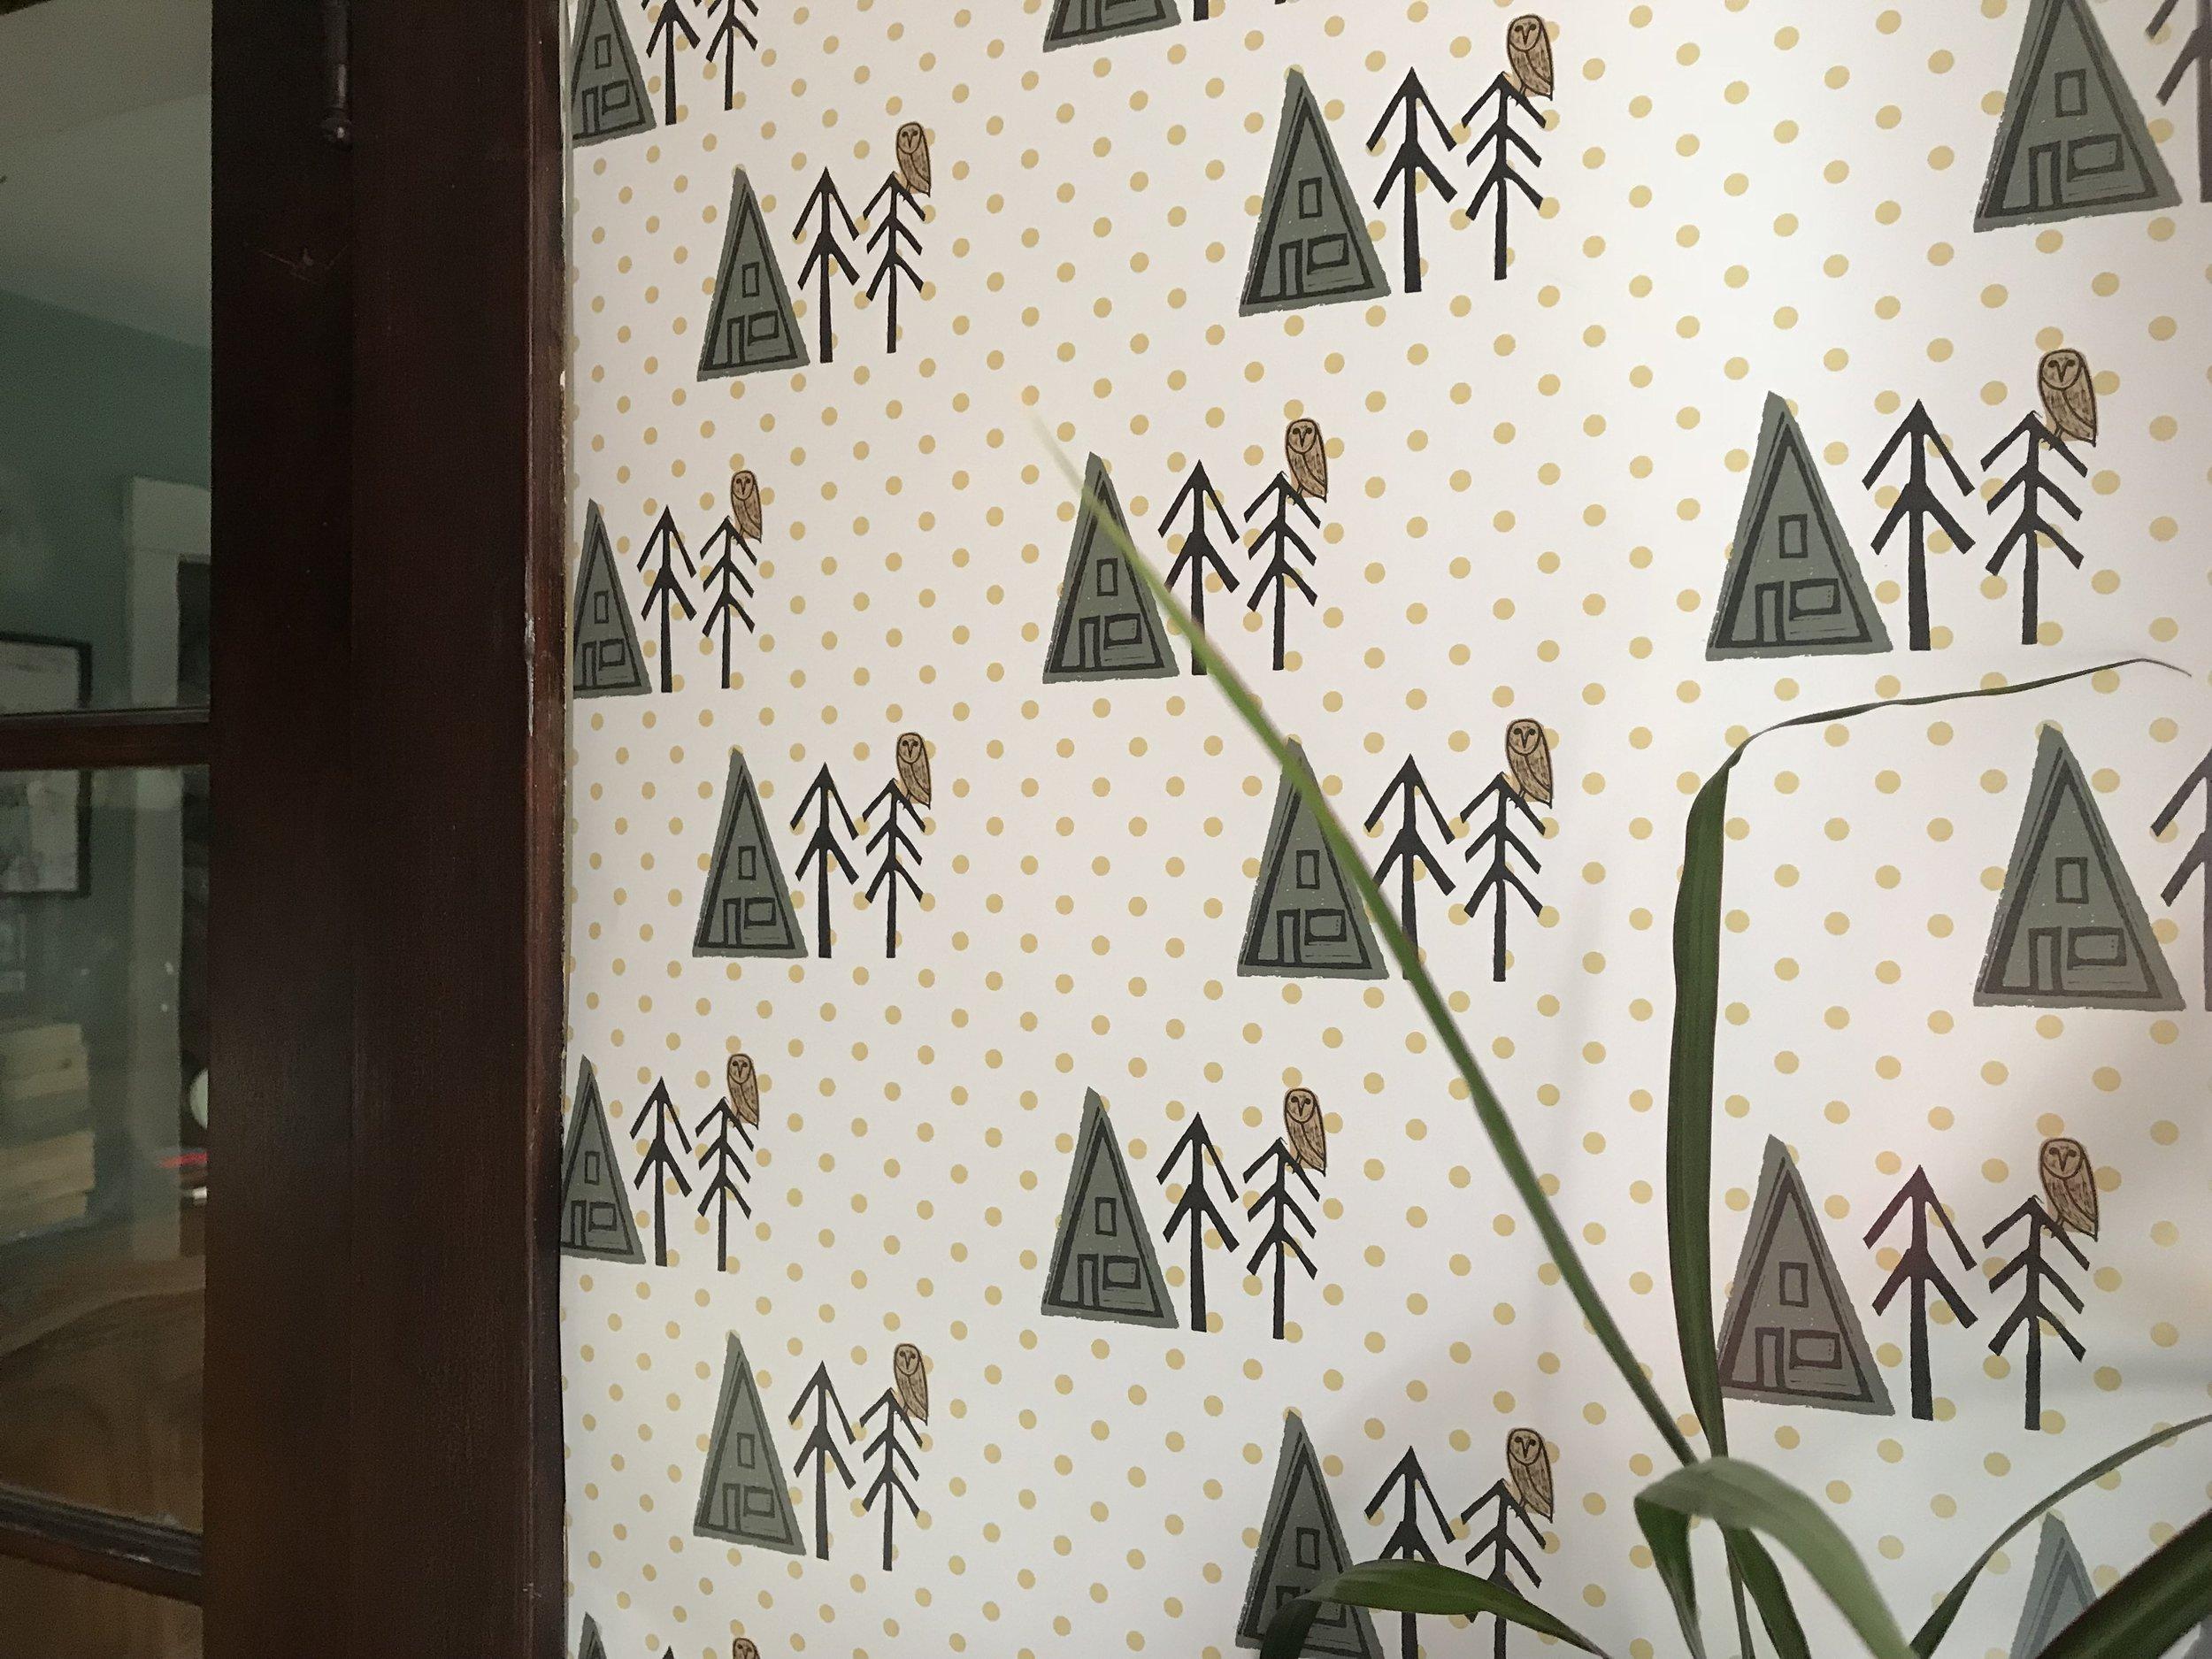 cabin wallpaper.jpg